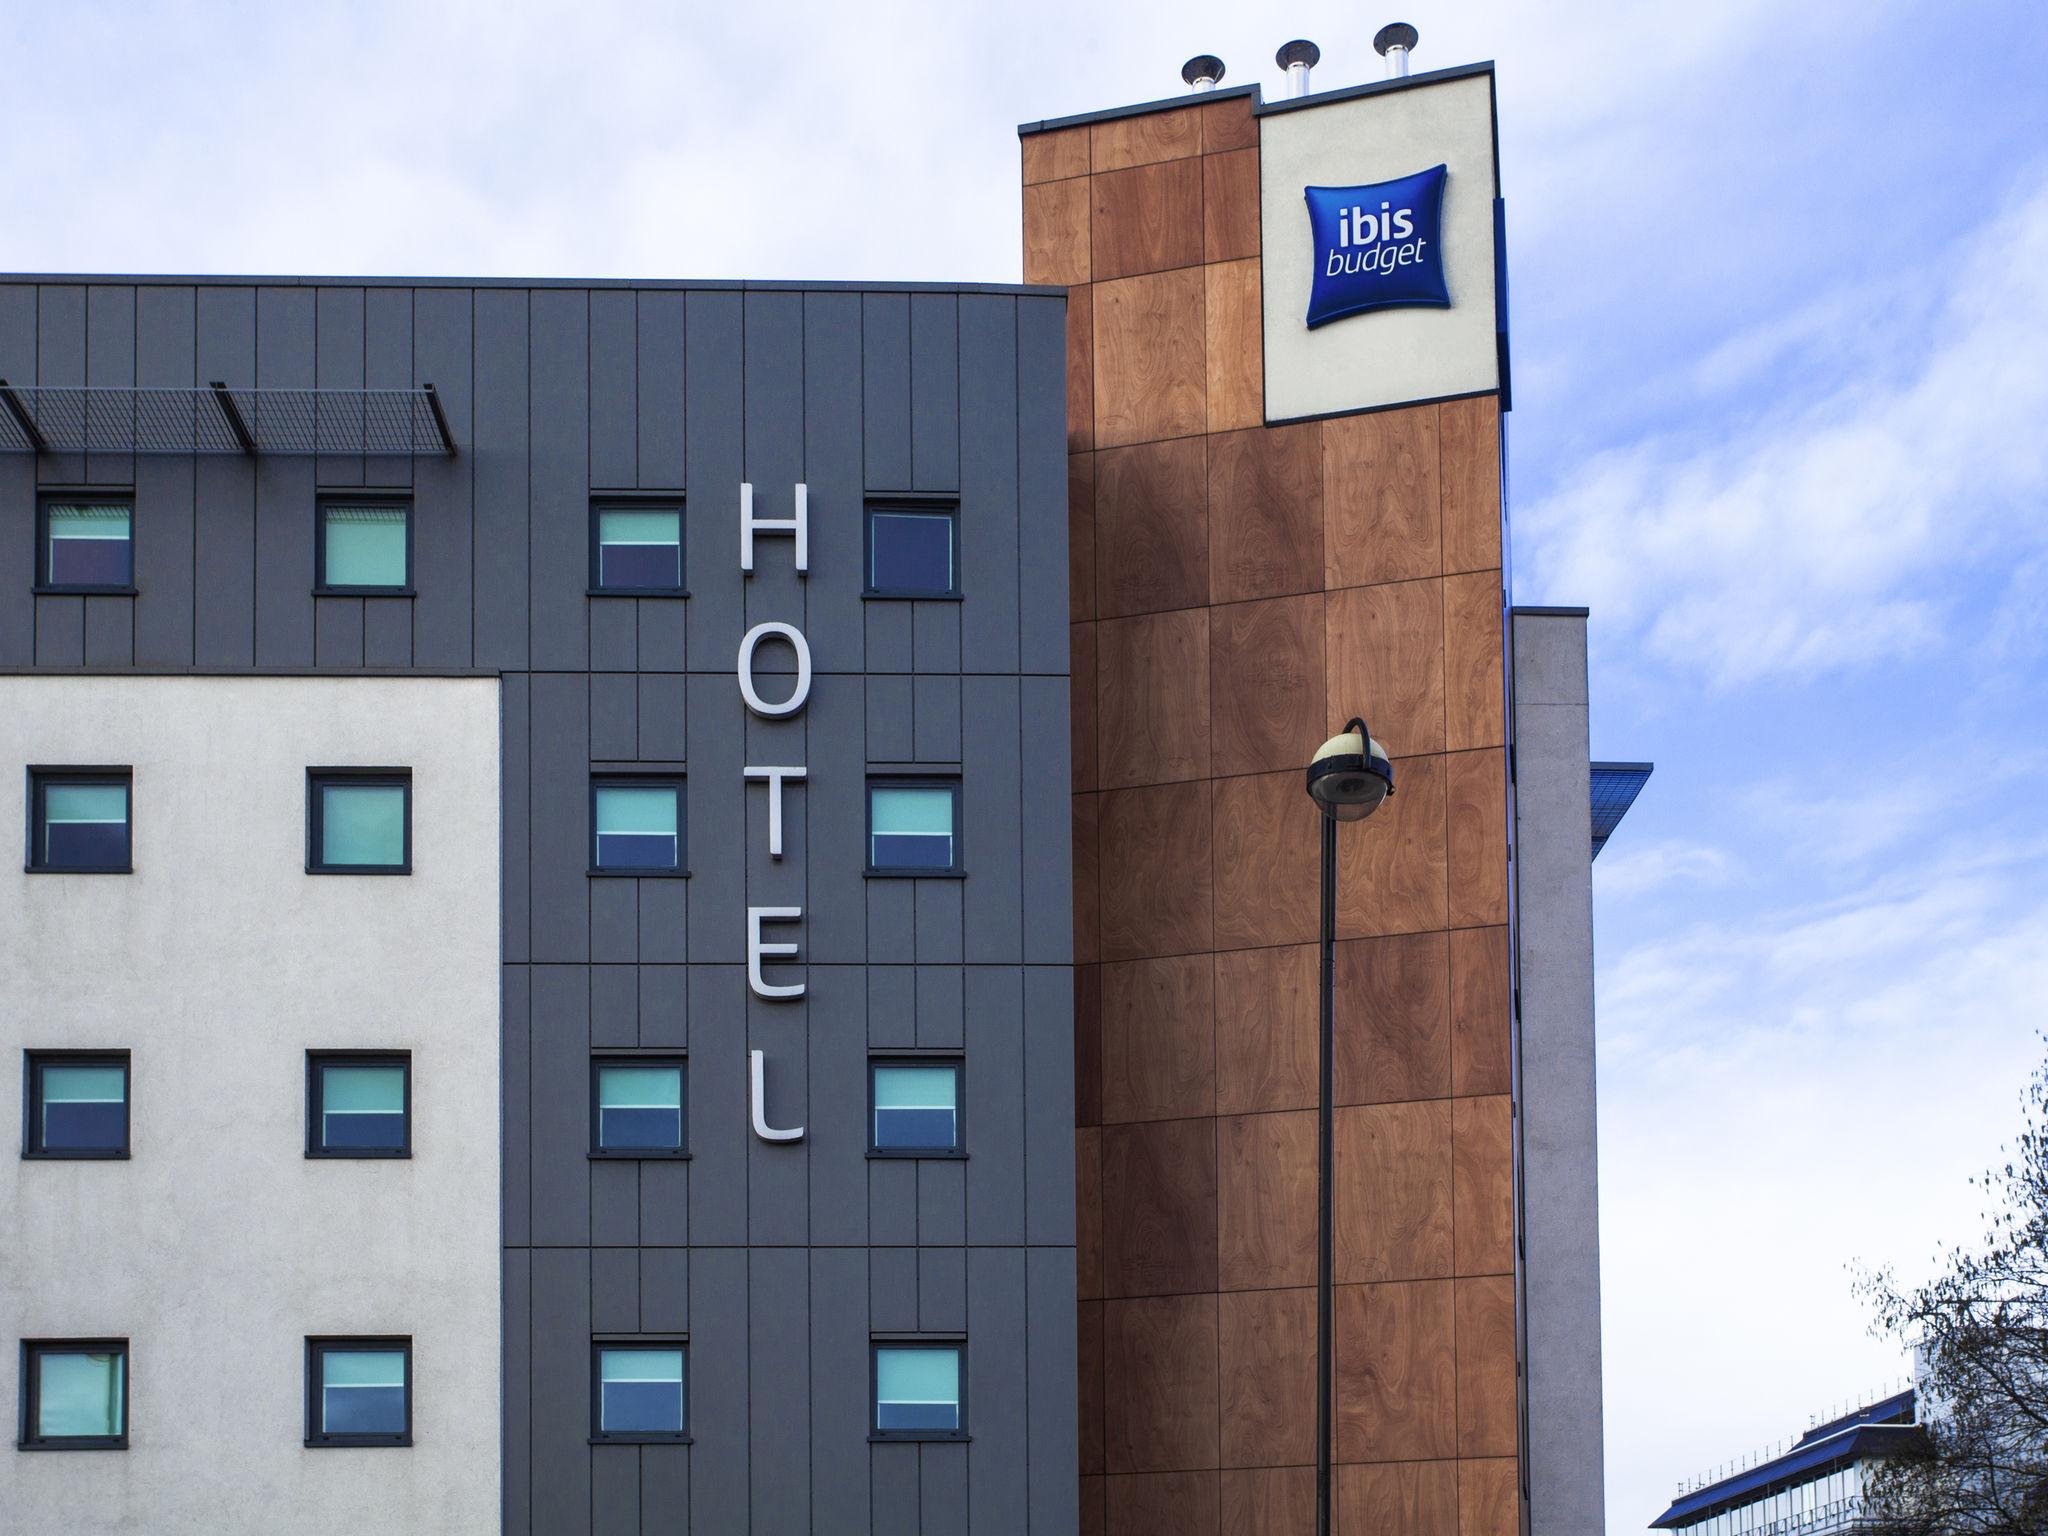 Hotel - ibis budget London Hounslow